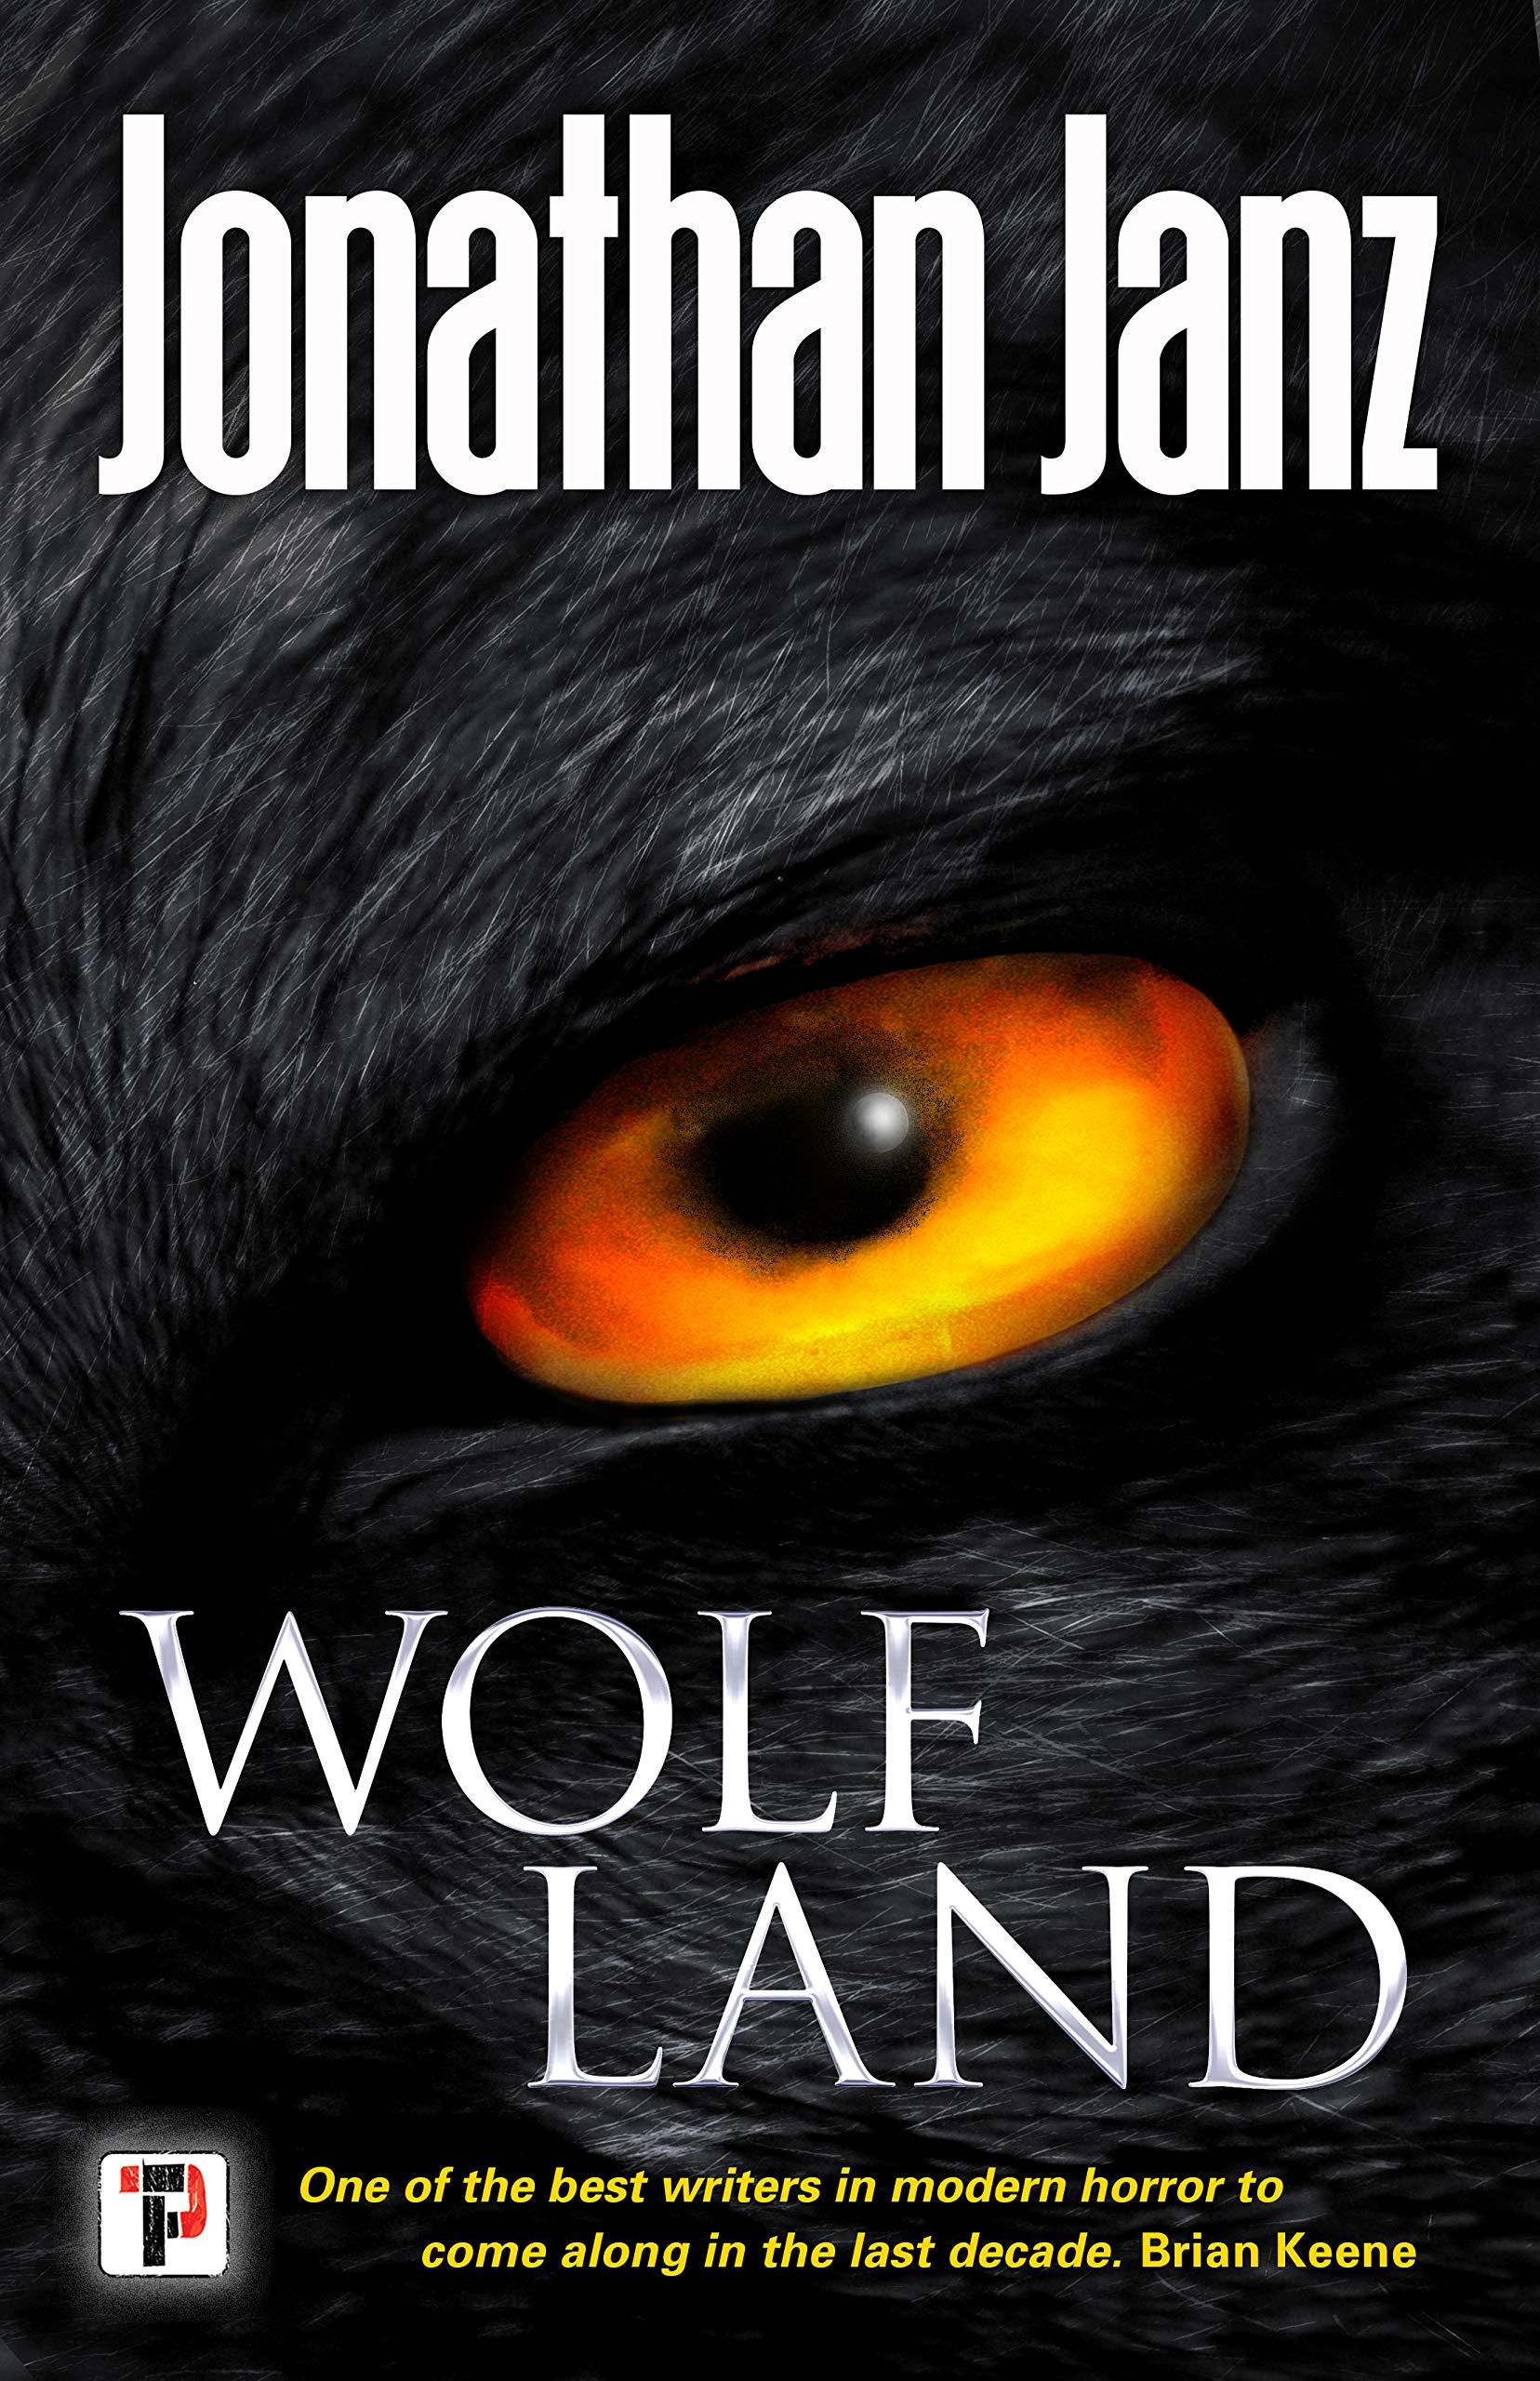 Wolf Land_Jonathan Janz.jpg